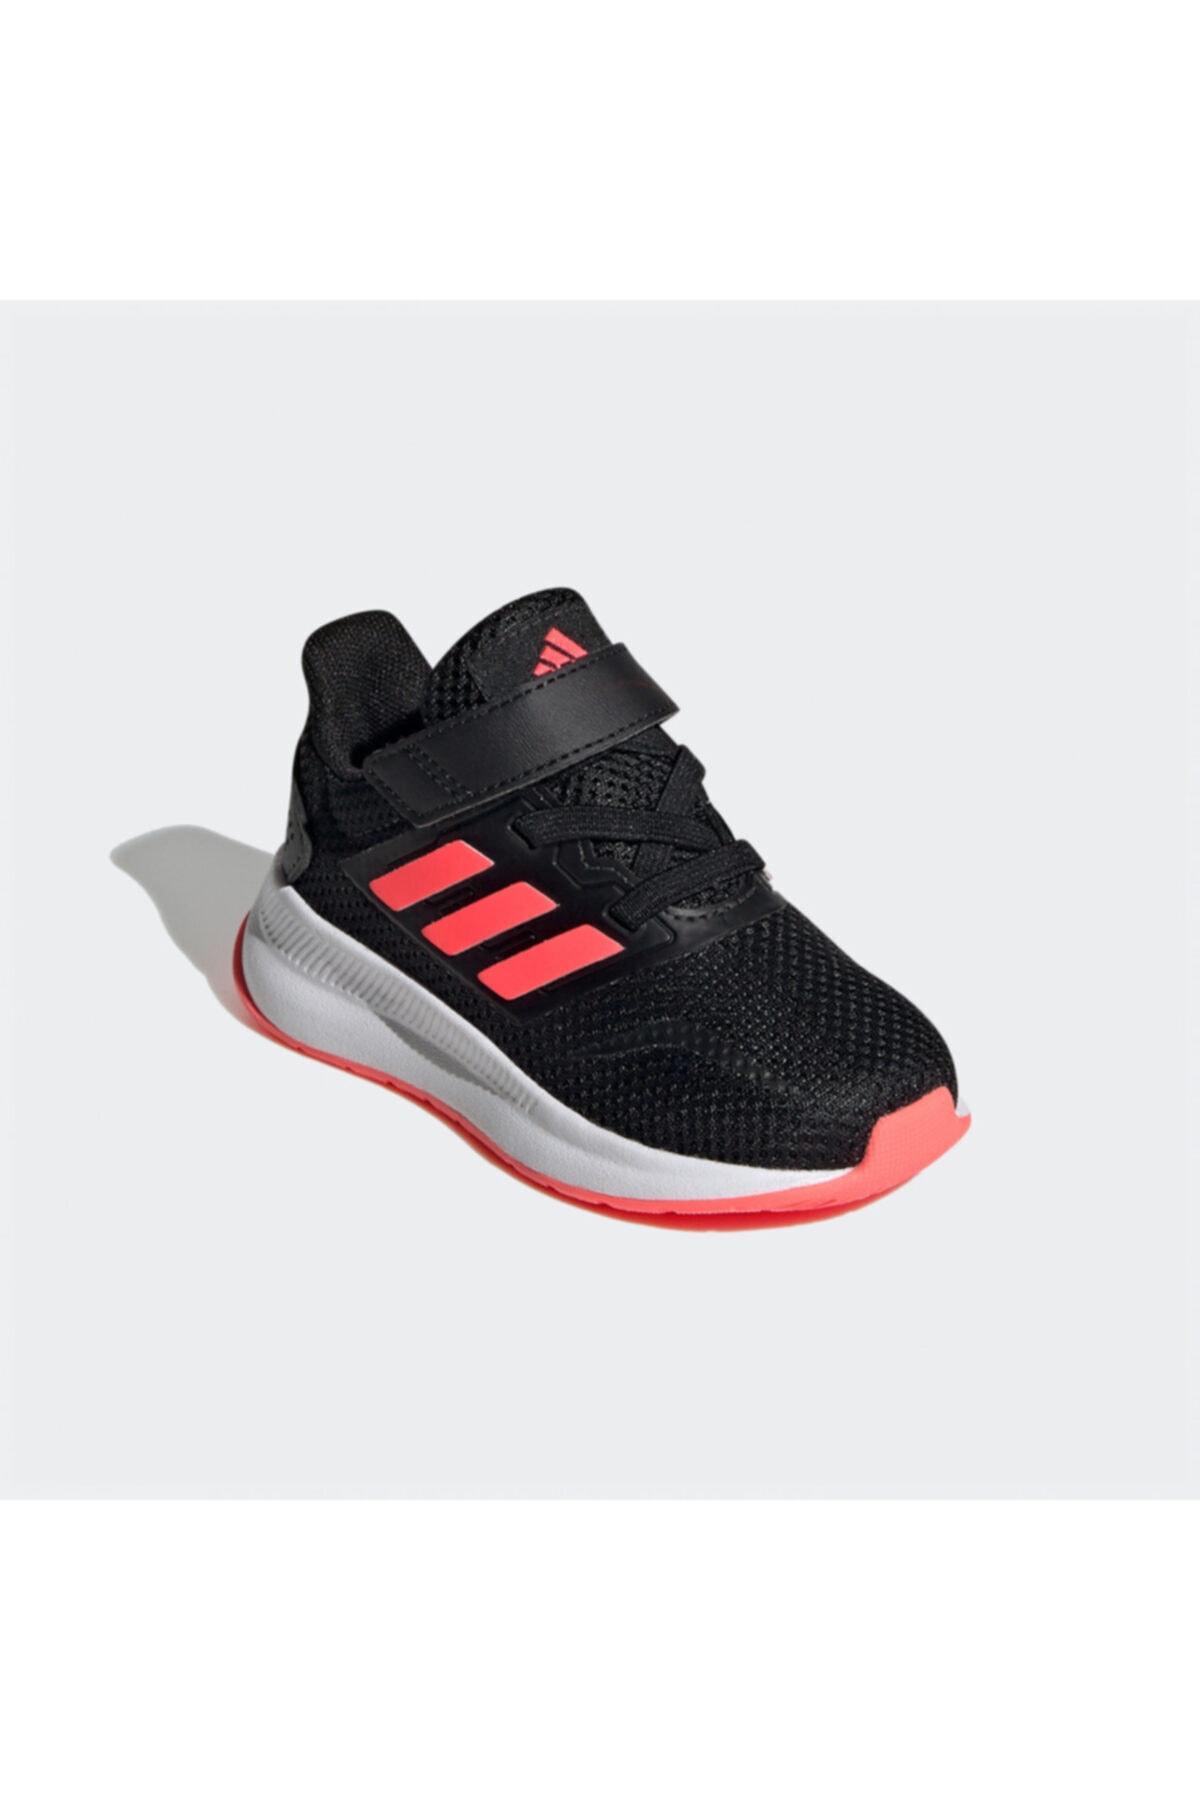 خرید نقدی کفش پیاده روی شیک برند ادیداس رنگ مشکی کد ty46954021